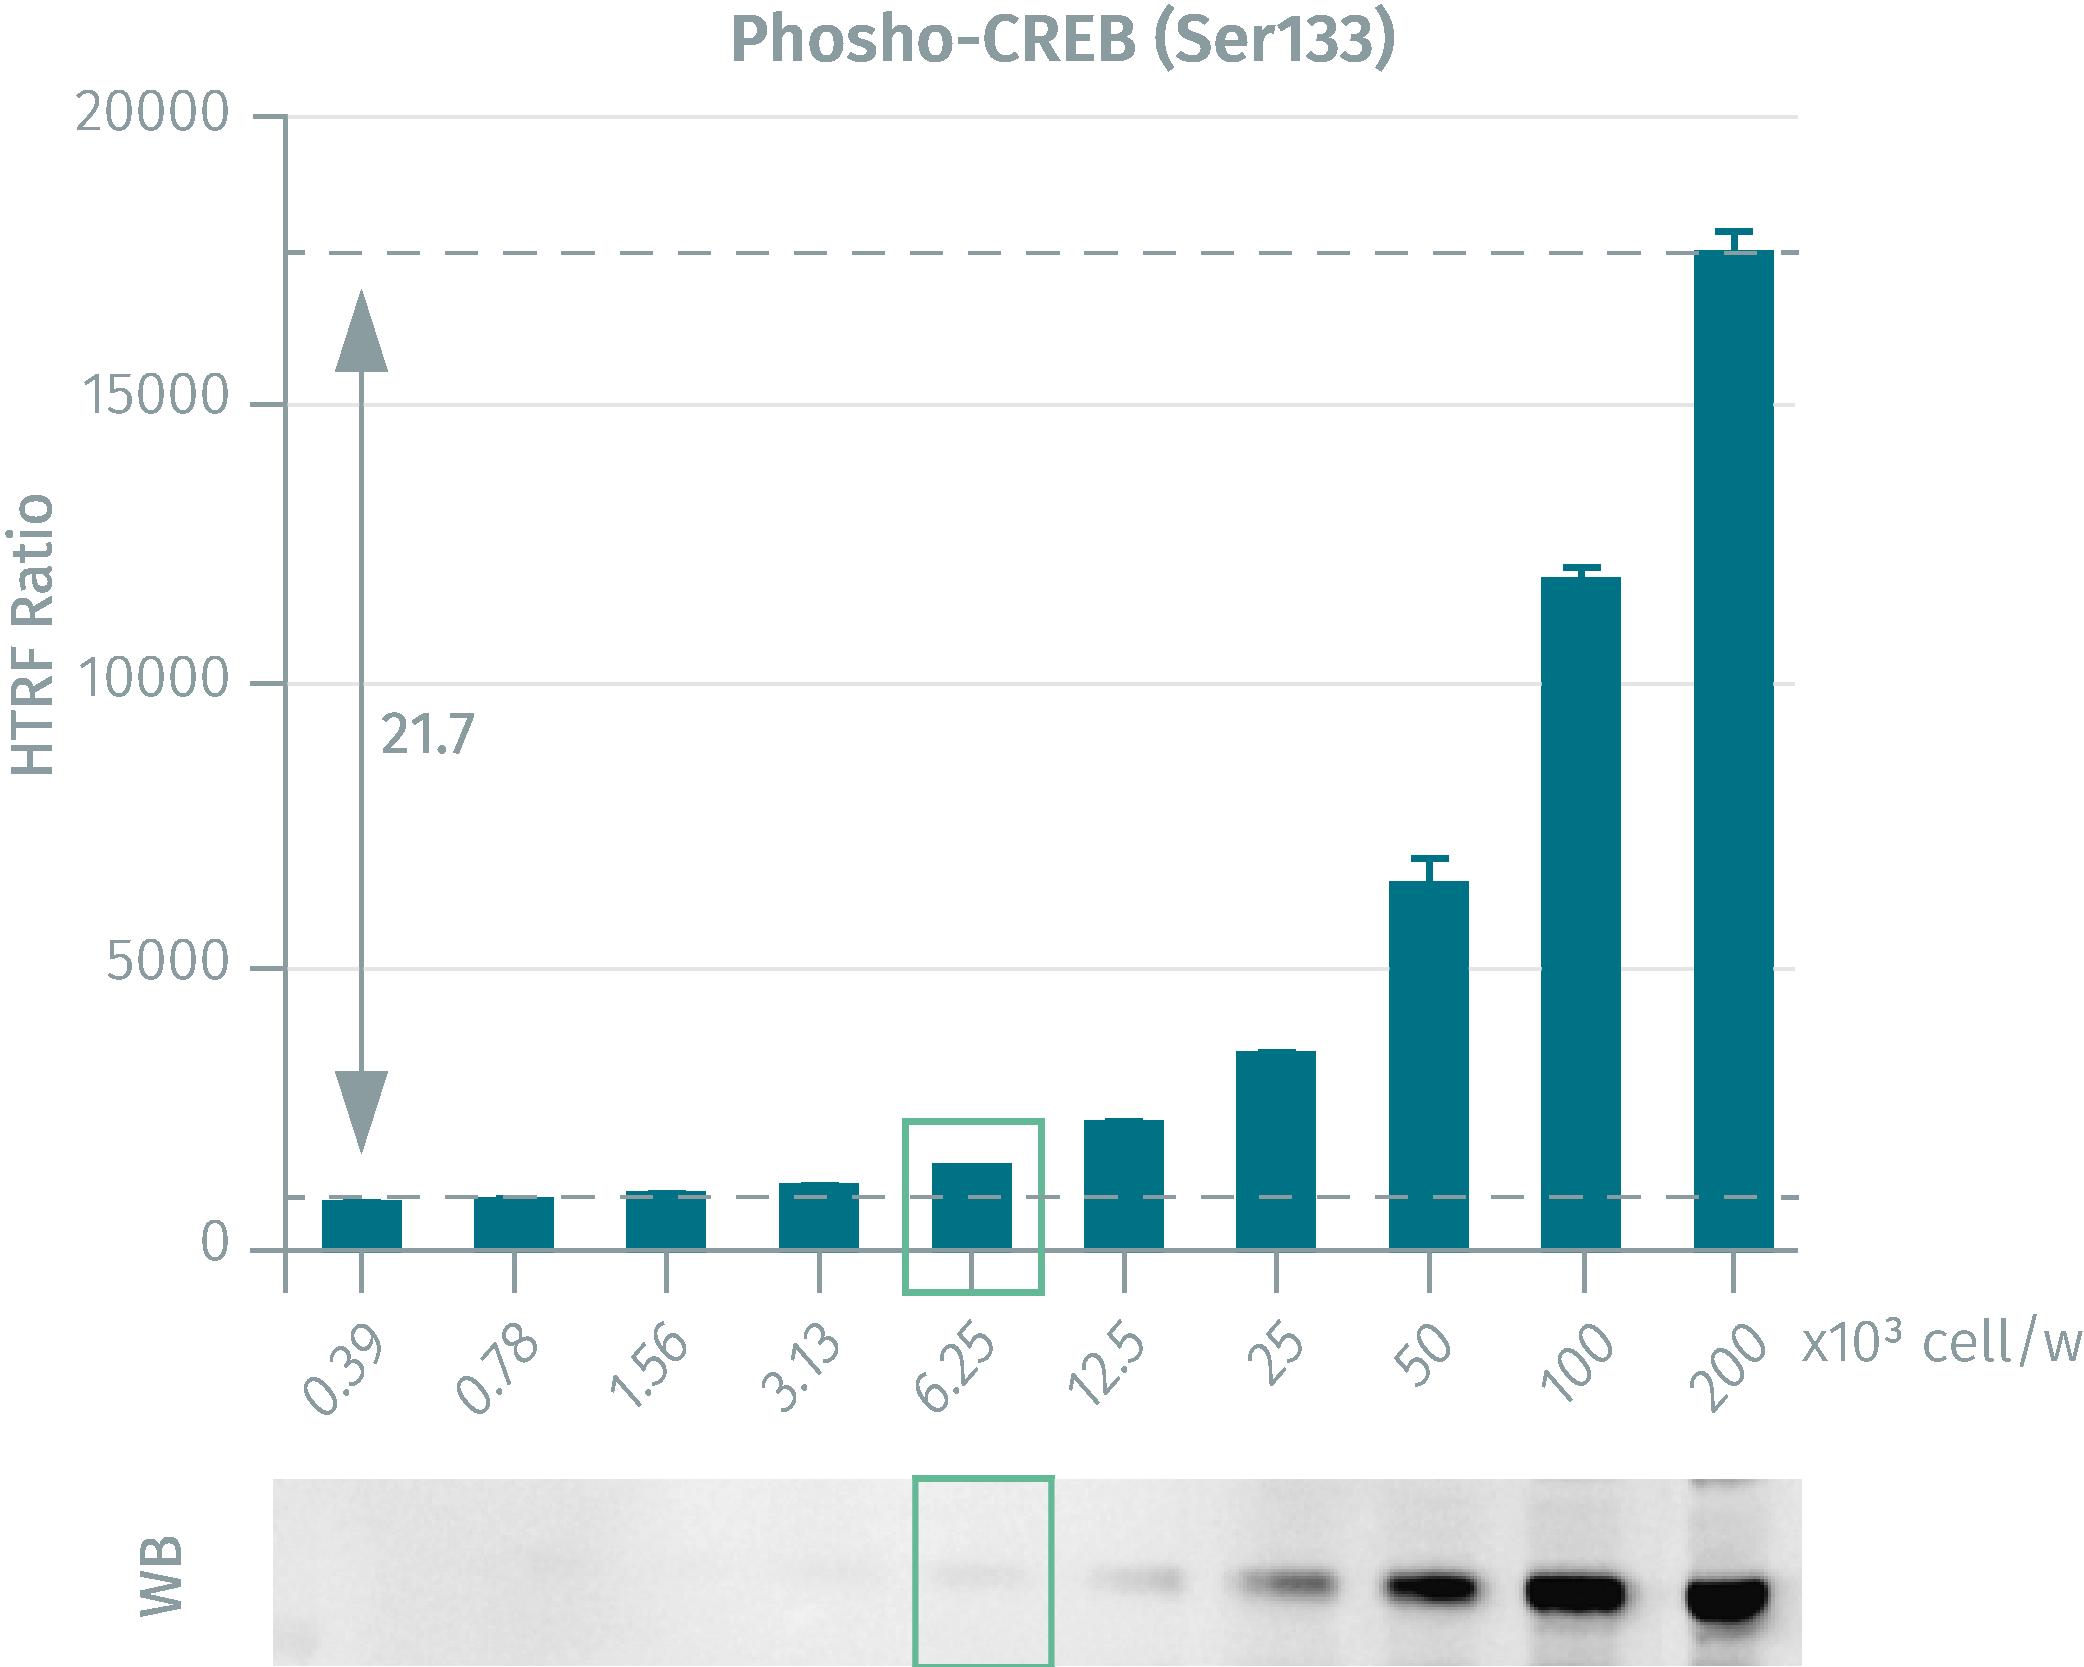 Western Blot versus HTRF phospho-CREB assays